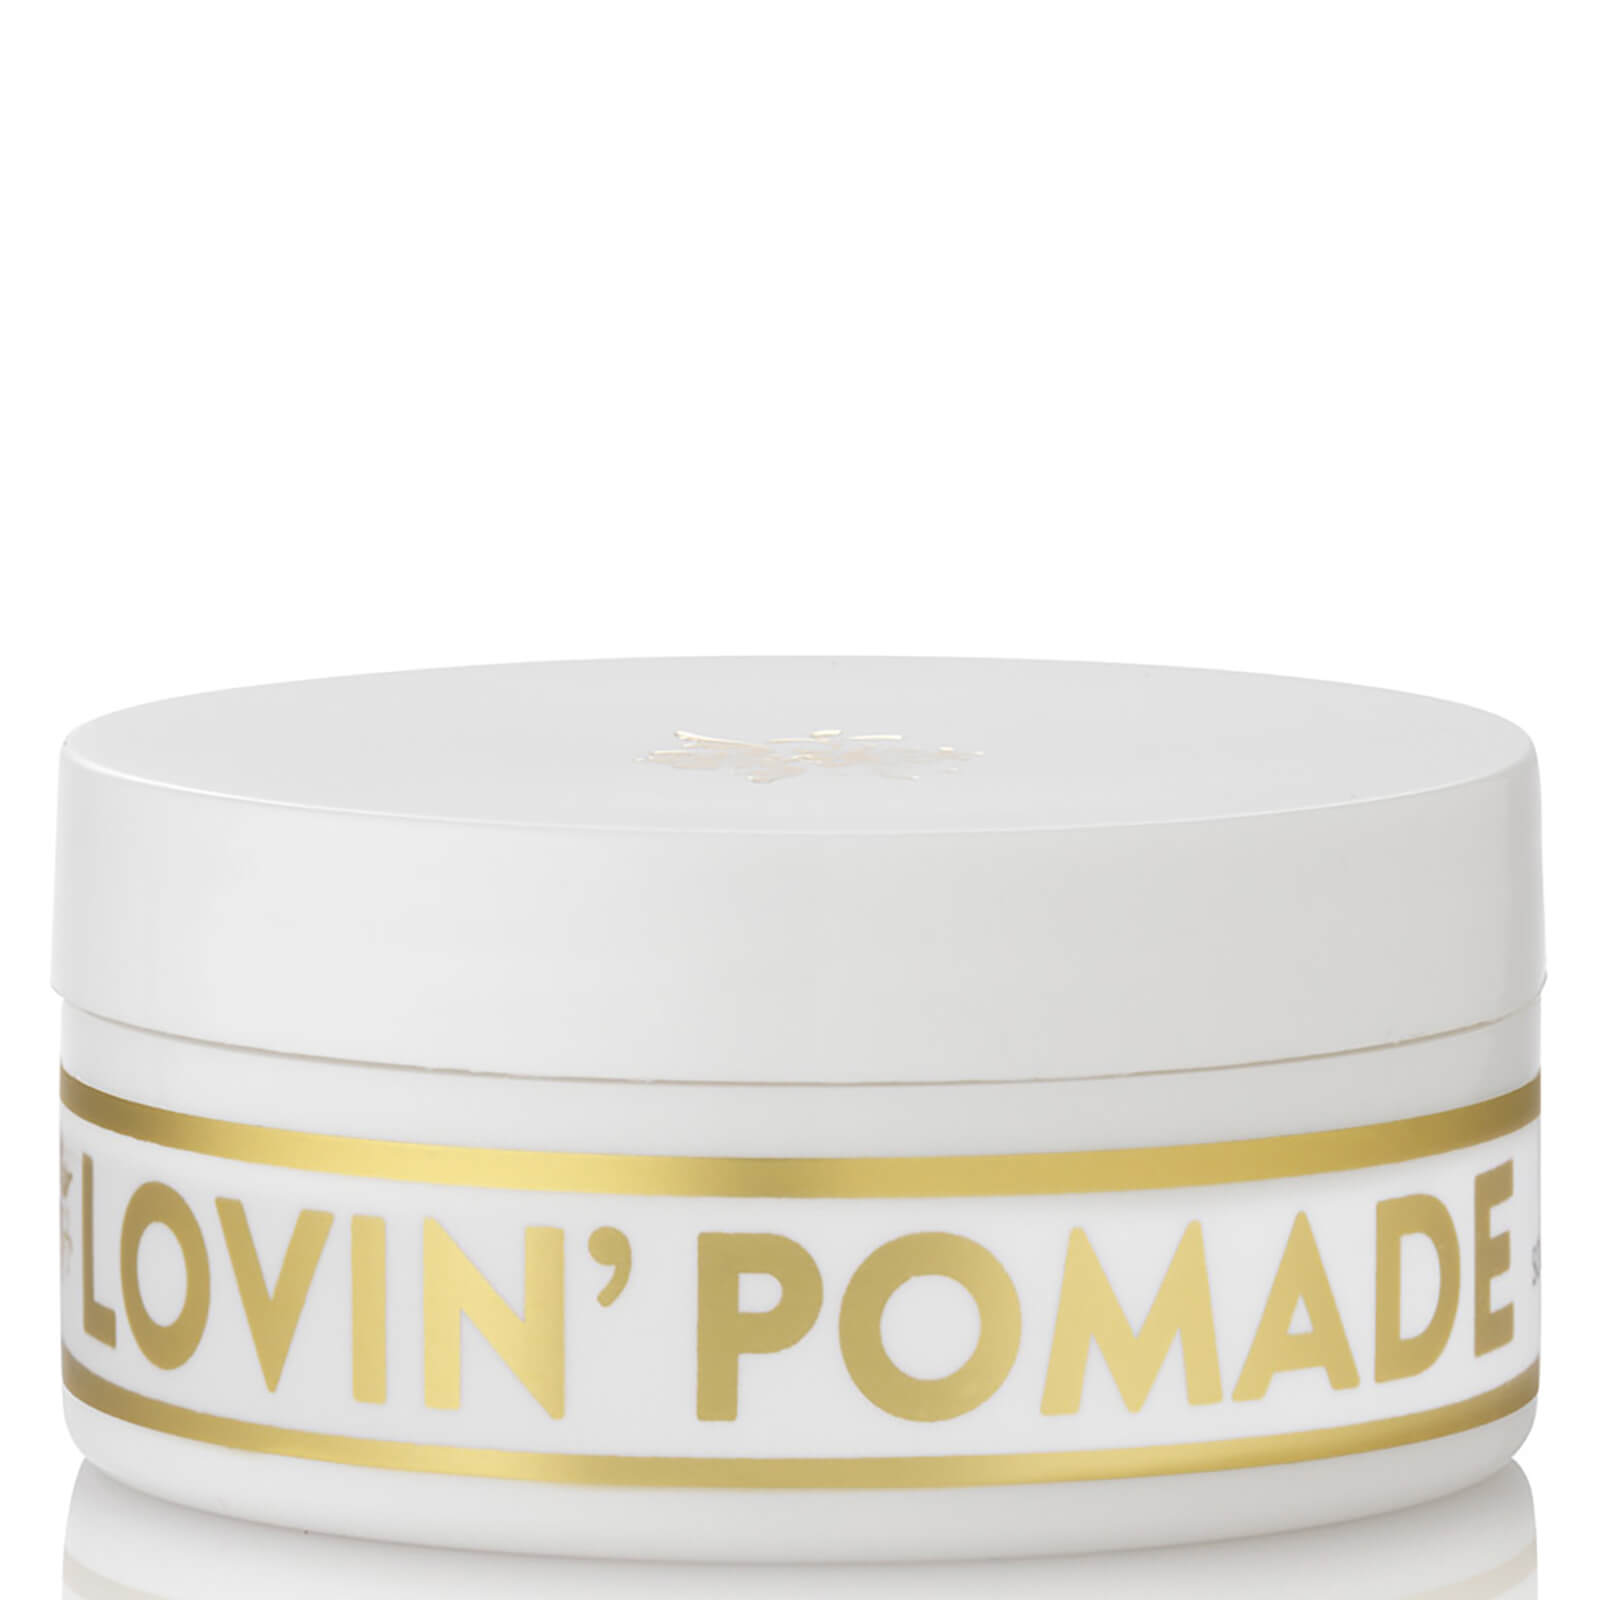 Look Fantastic coupon: Philip B Lovin' Pomade 2 oz.